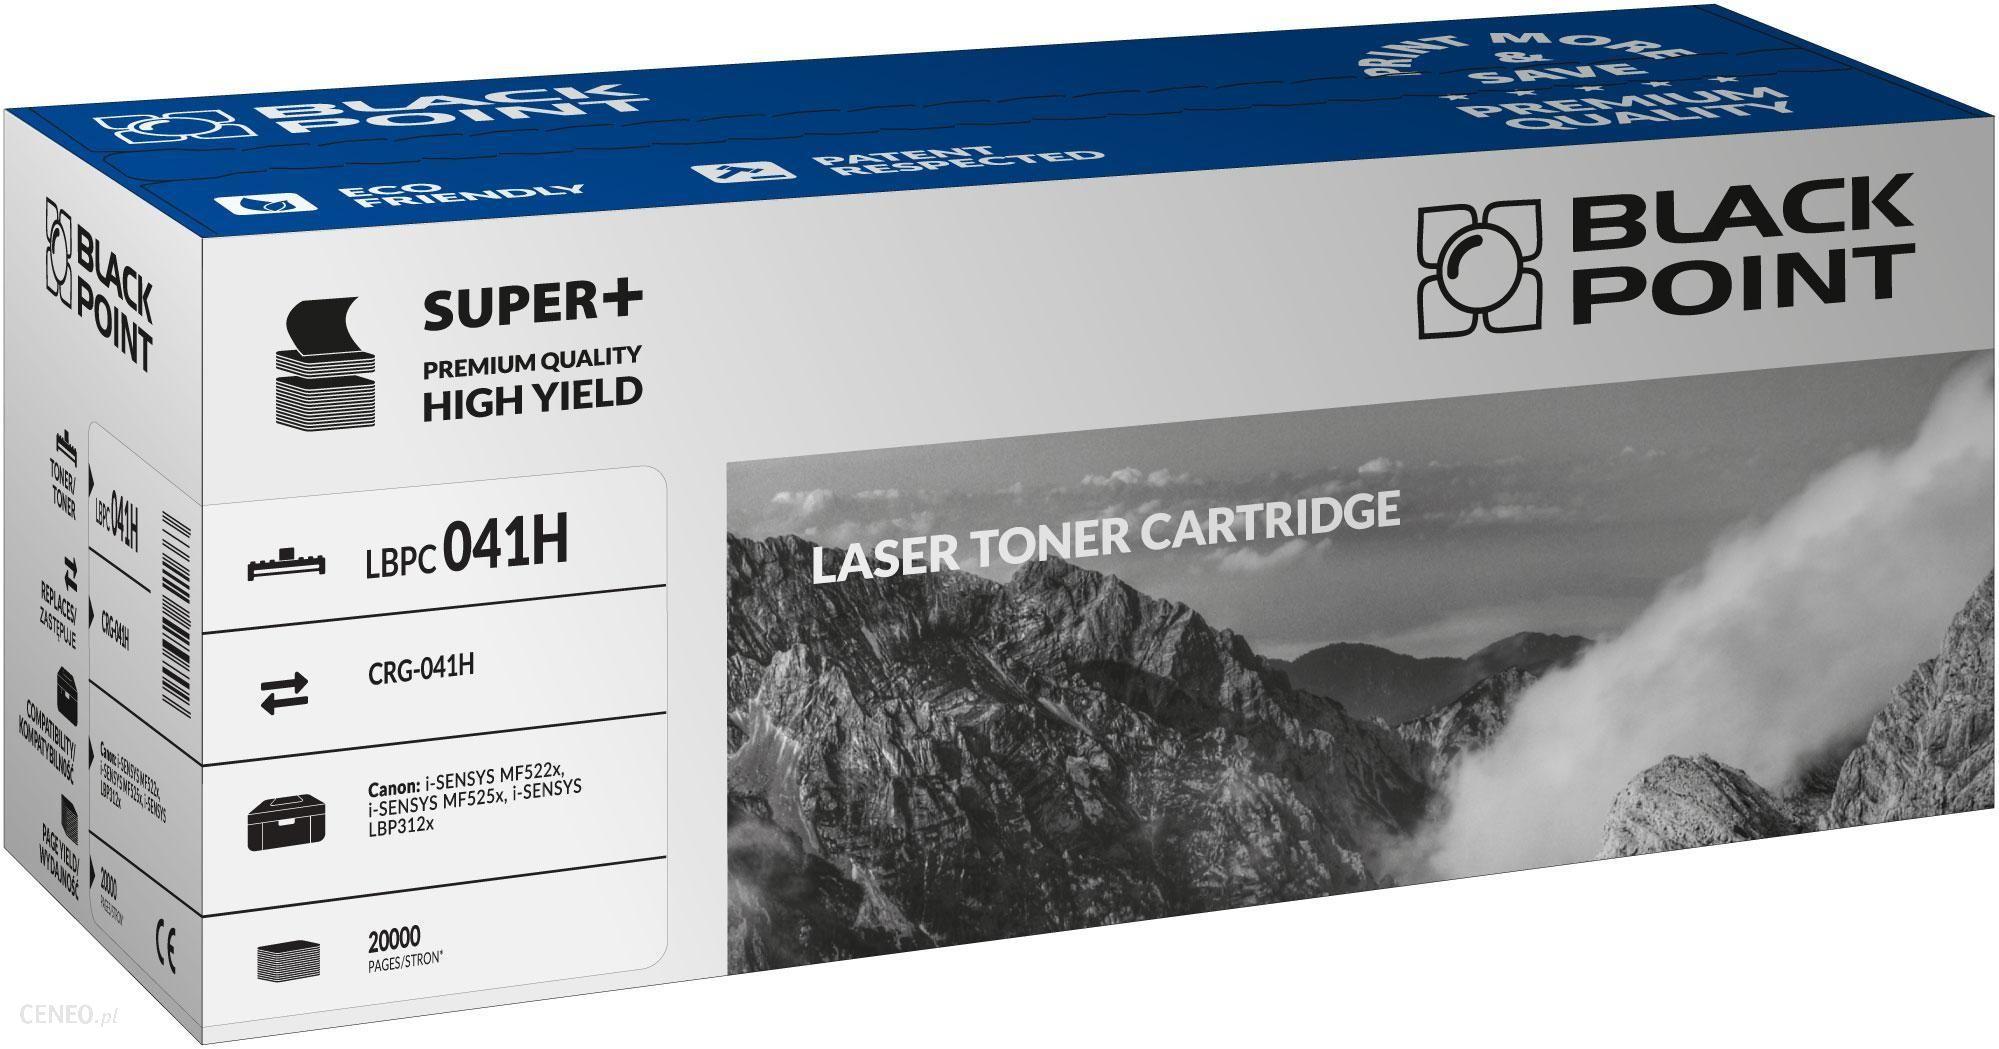 Black Point Zgodny z Canon CRG-041H Super PLUS do Canon i-SENSYS MF522x, i-SENSYS MF525x, i-SENSYS LBP312x